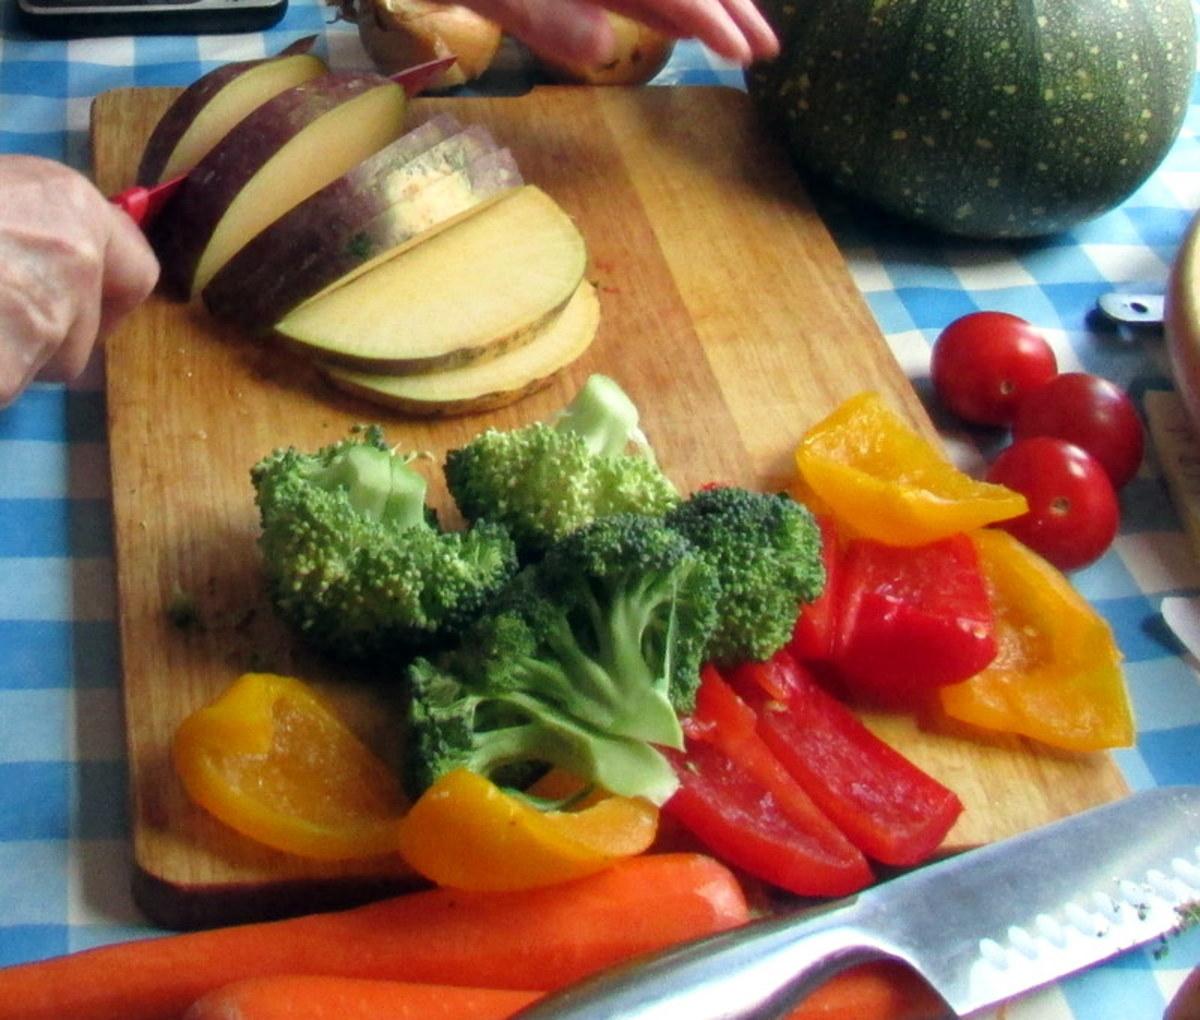 Preparing the vegatables for roasting in the oven